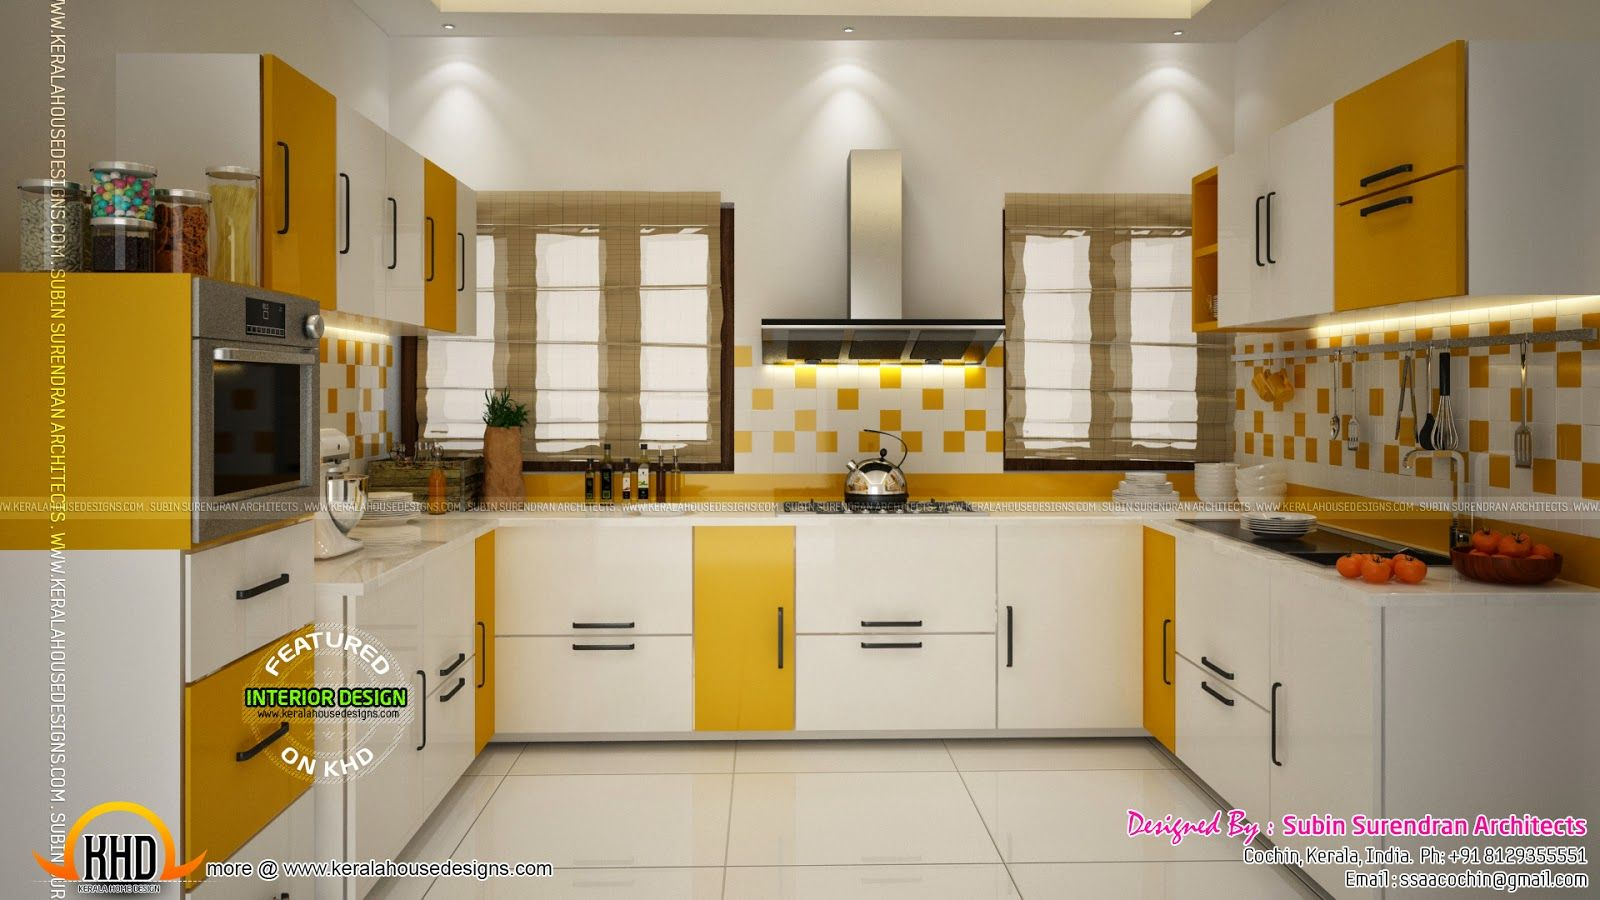 Kerala Home Design Floor Plans Interior Design Cochin